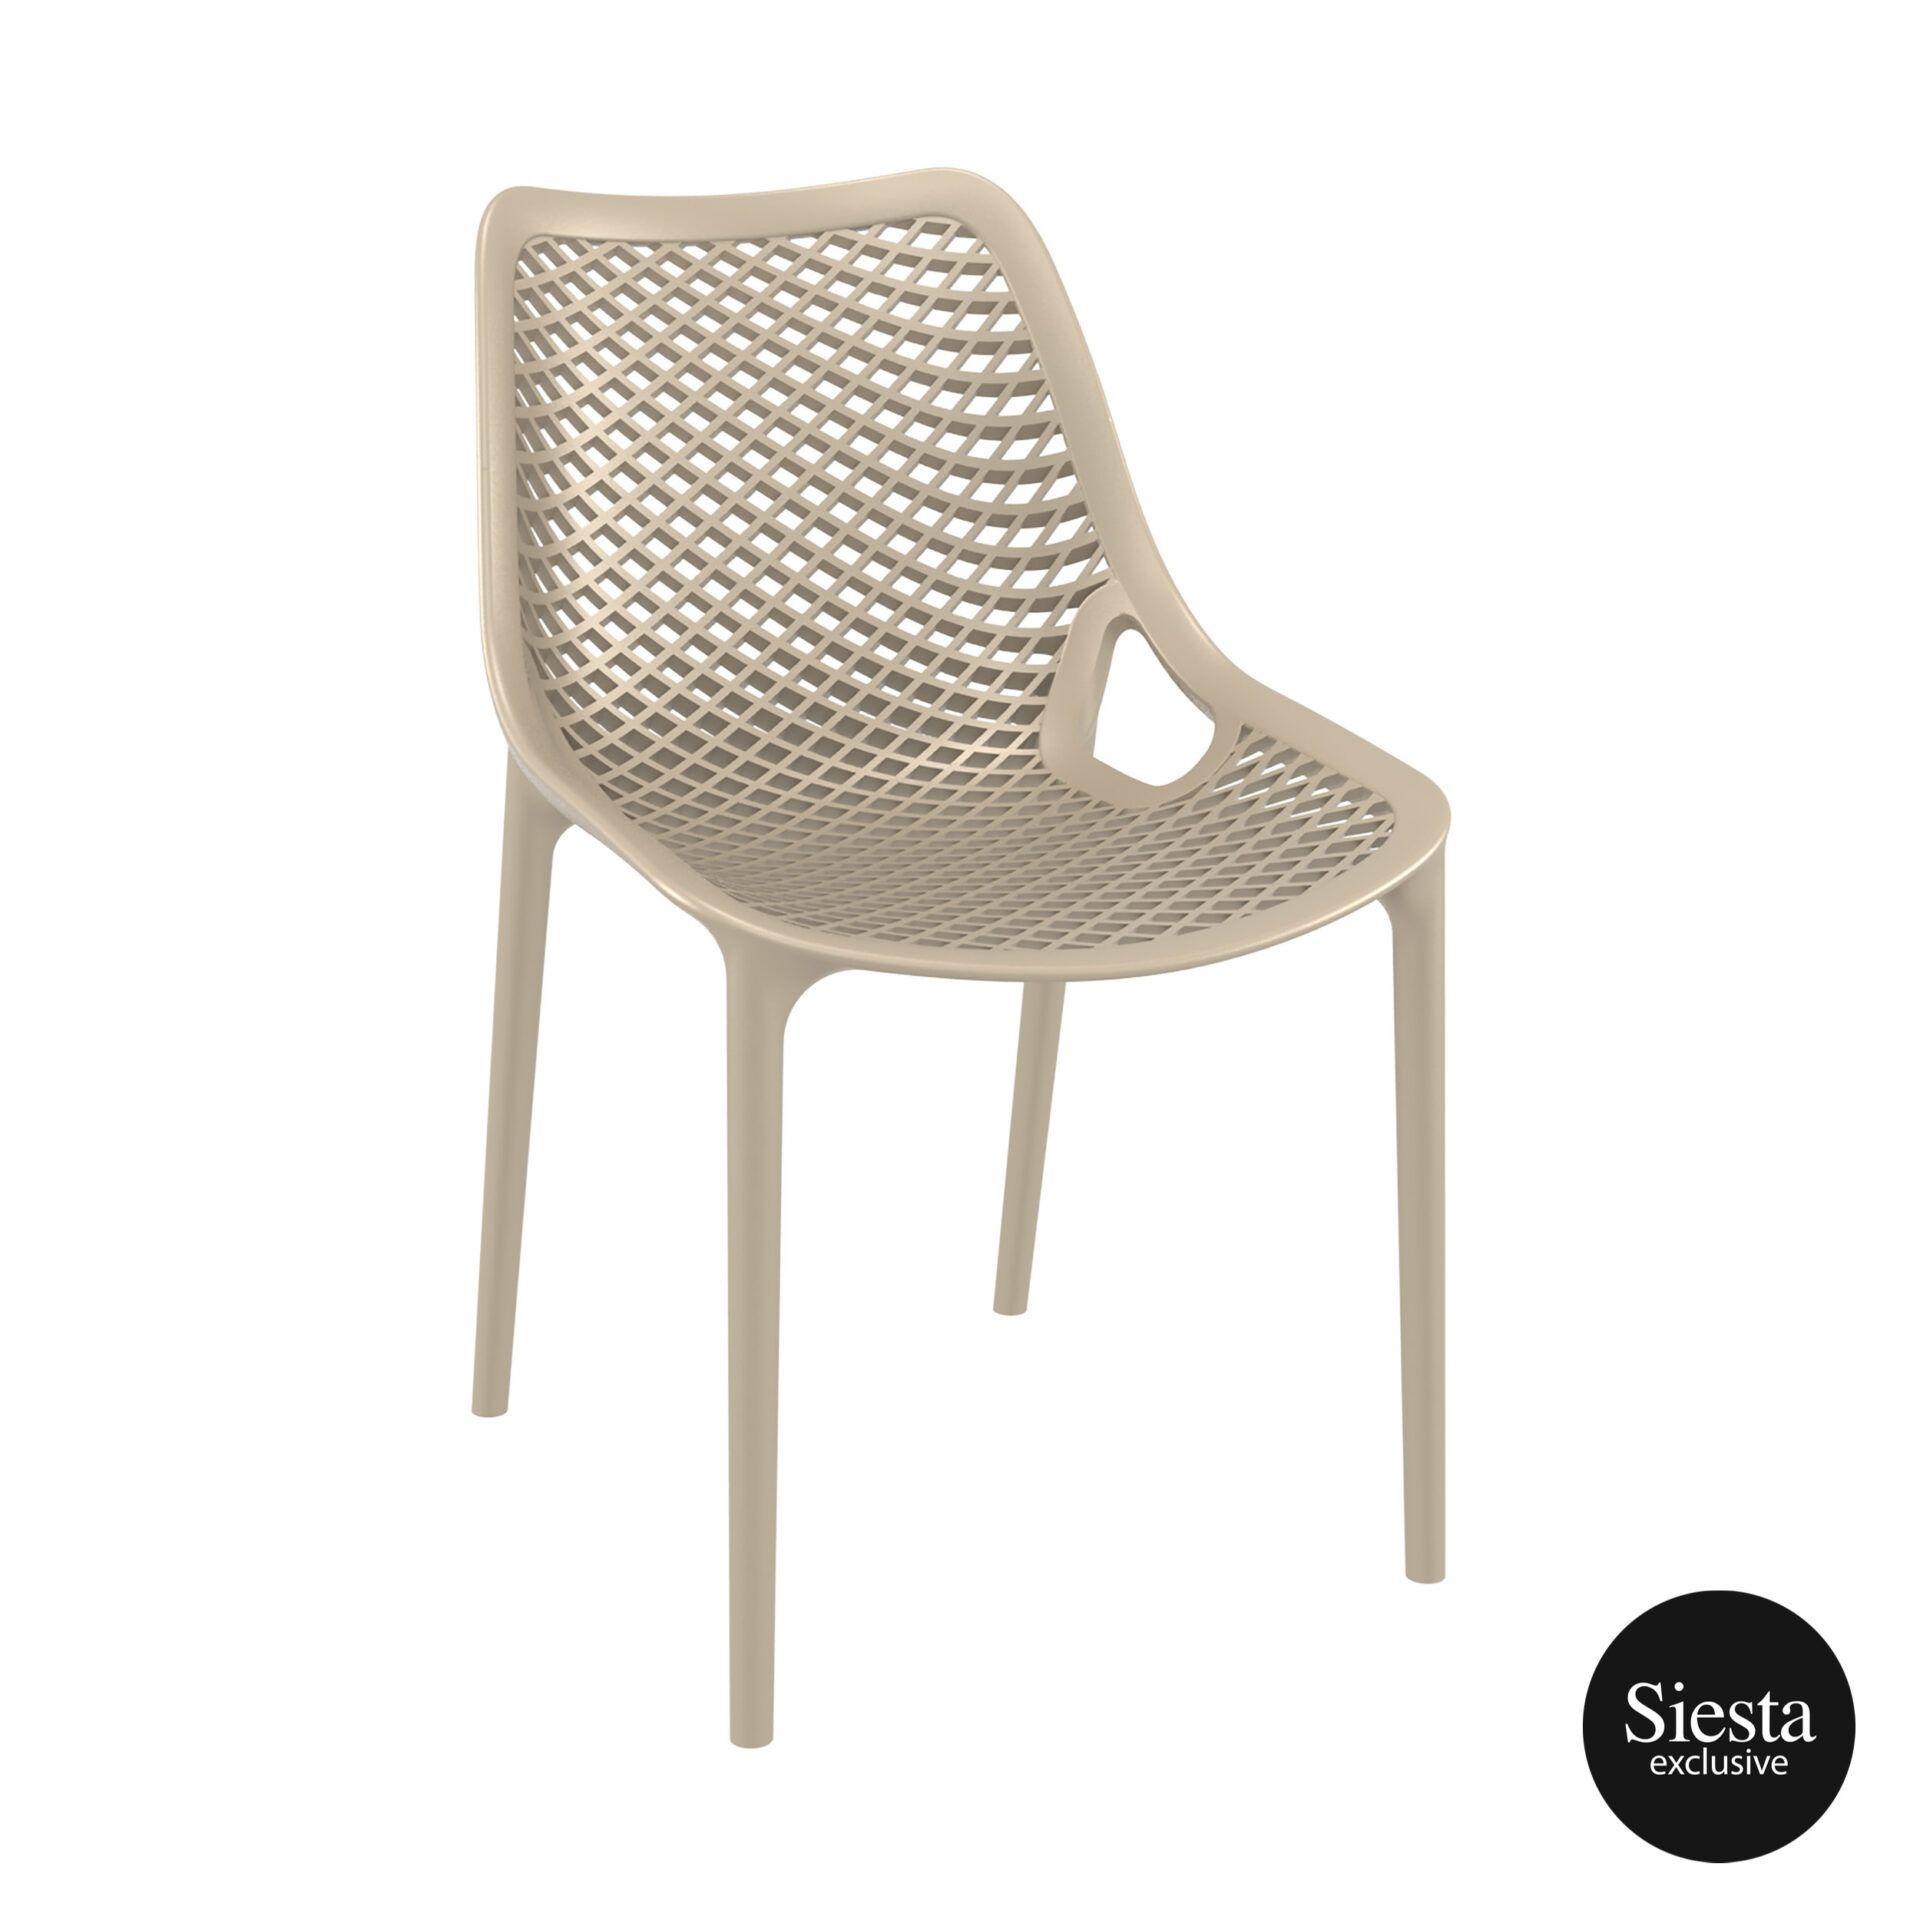 original siesta air chair dovegrey front side